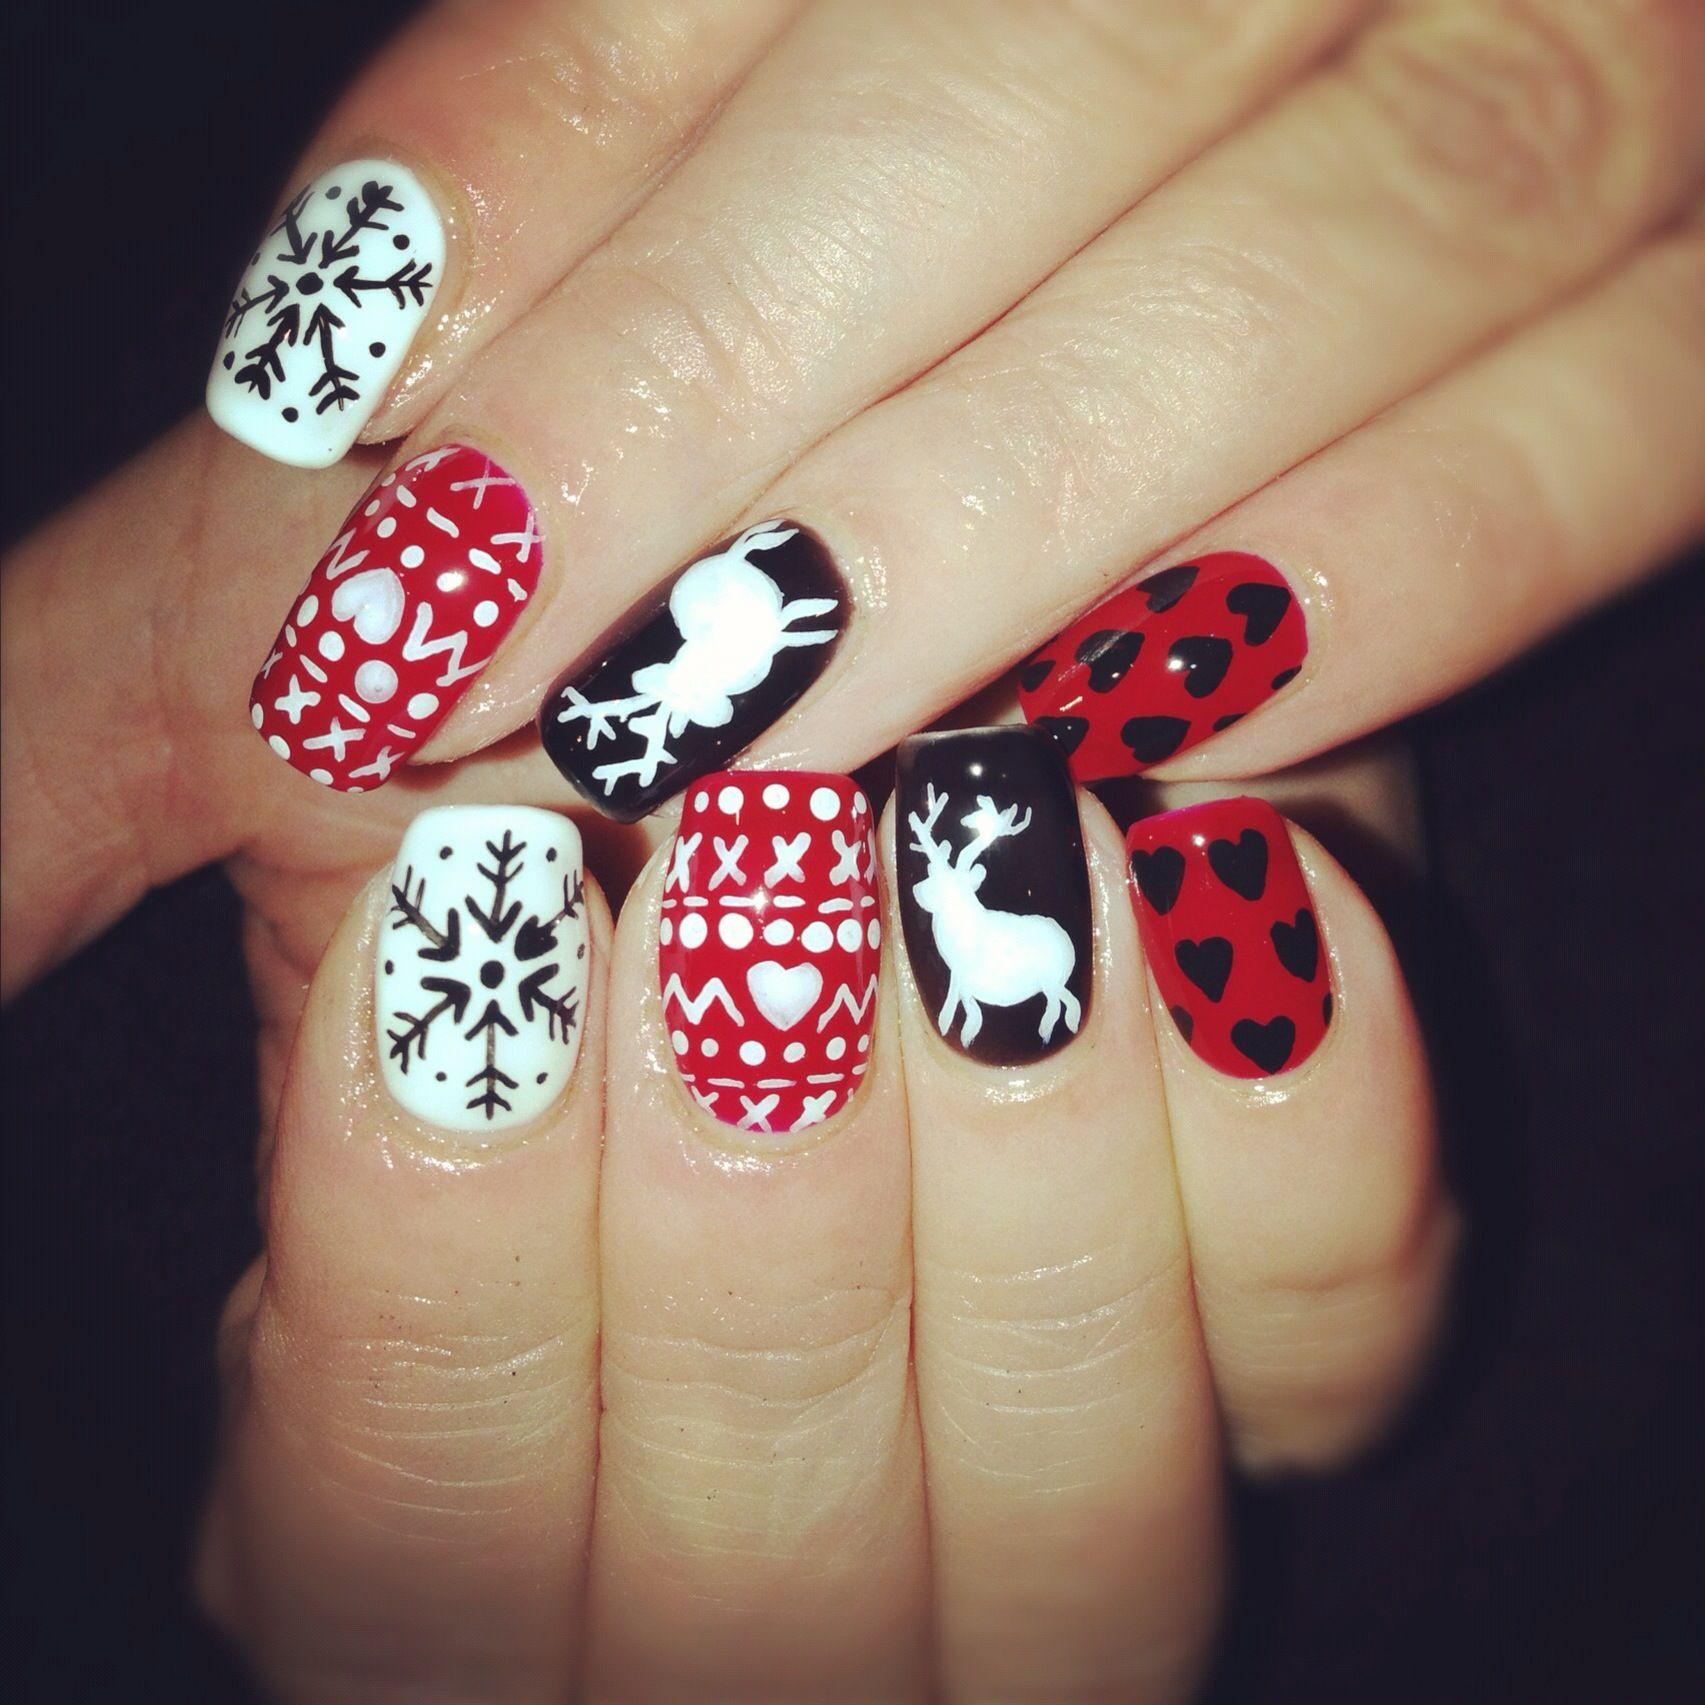 nail art ideas, easy nail art ideas, new nail art design, diy nail